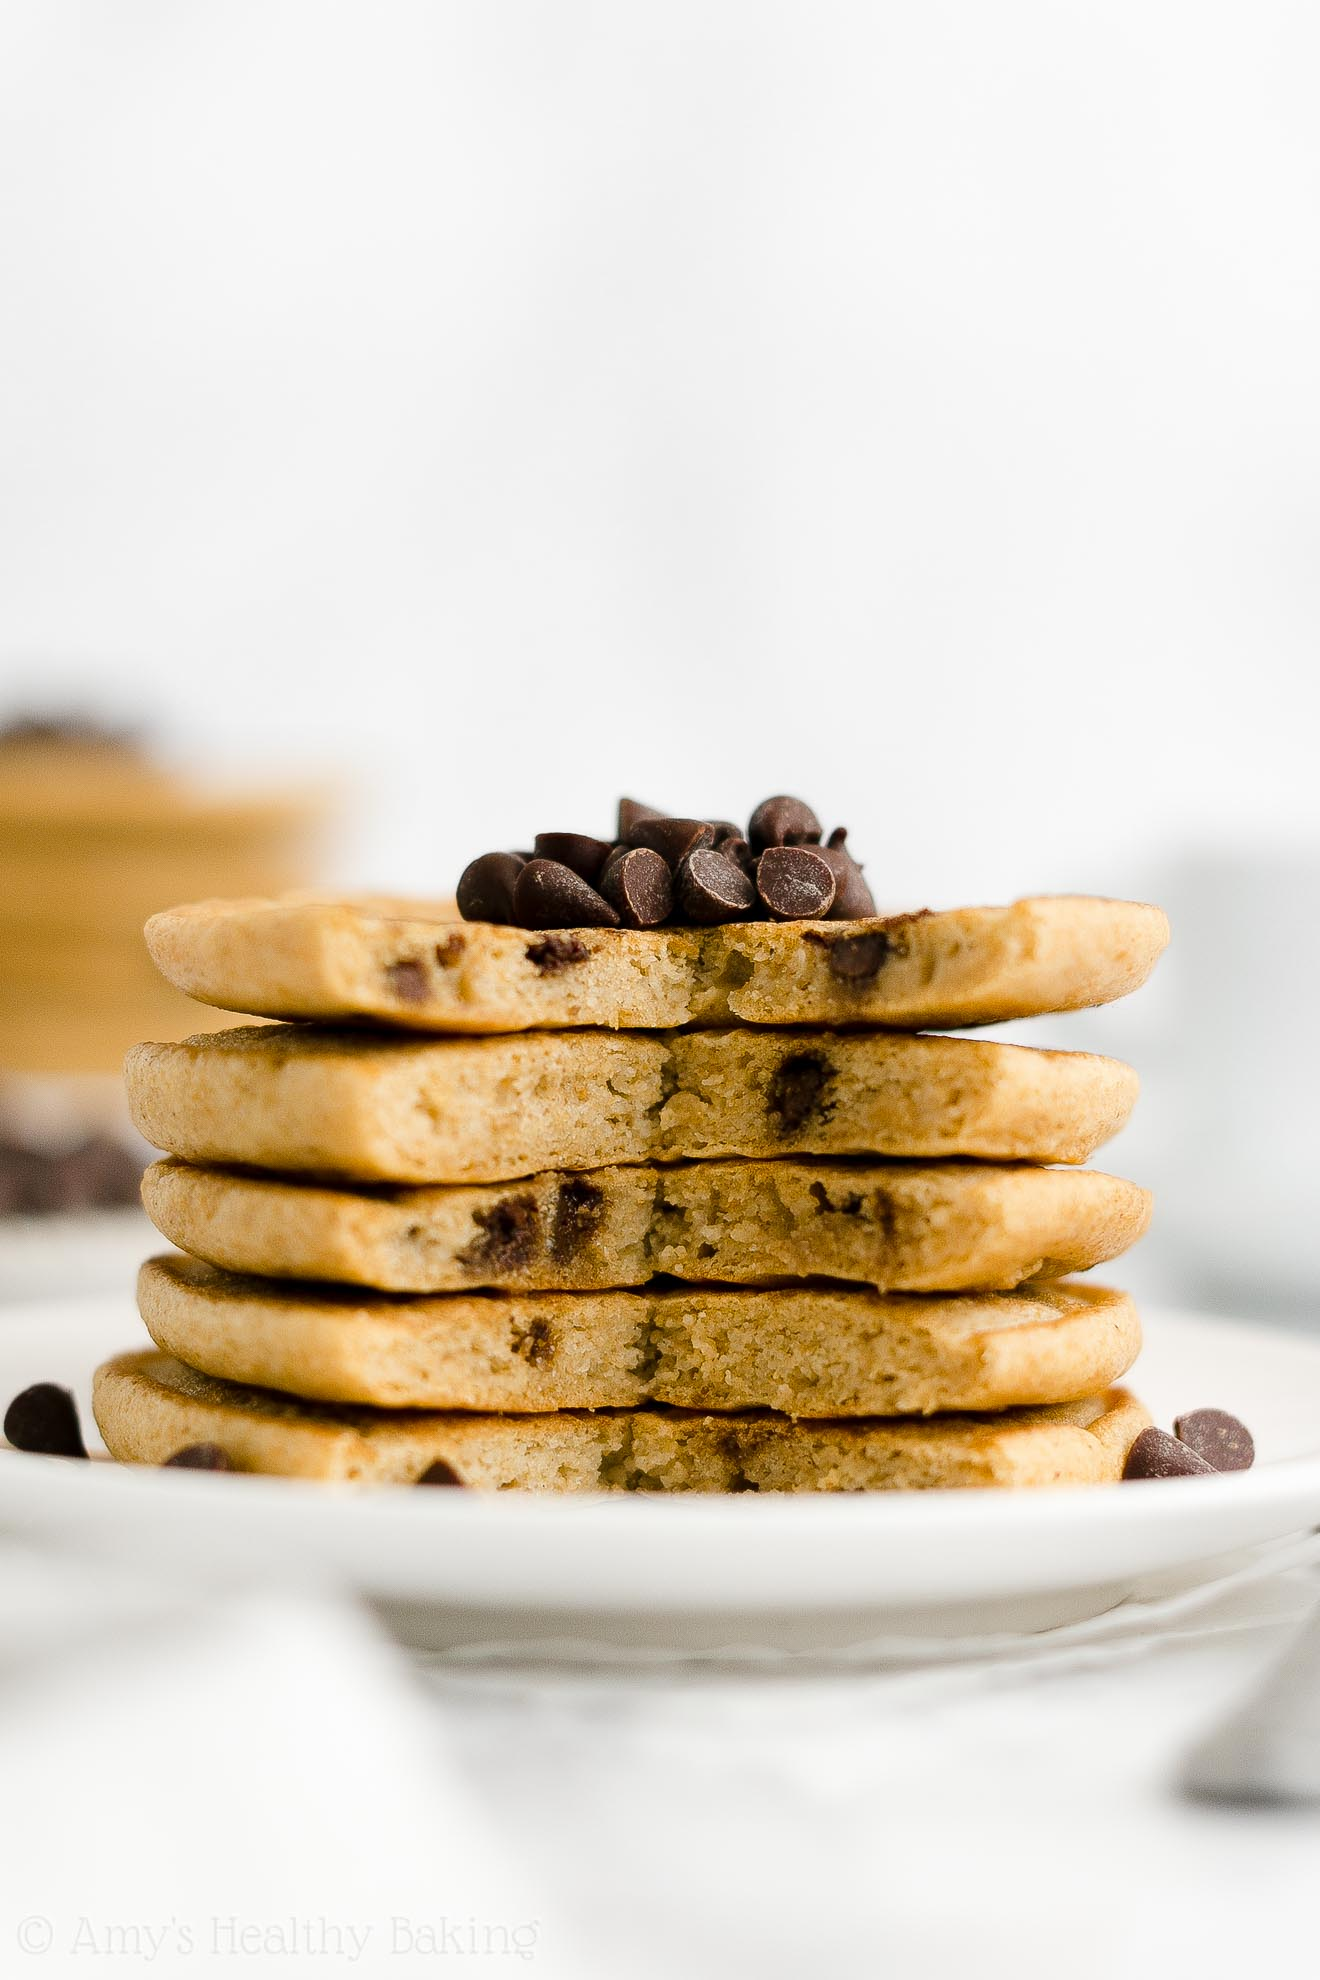 ULTIMATE Best Easy Healthy Clean Eating Low Sugar Chocolate Chip Pancakes